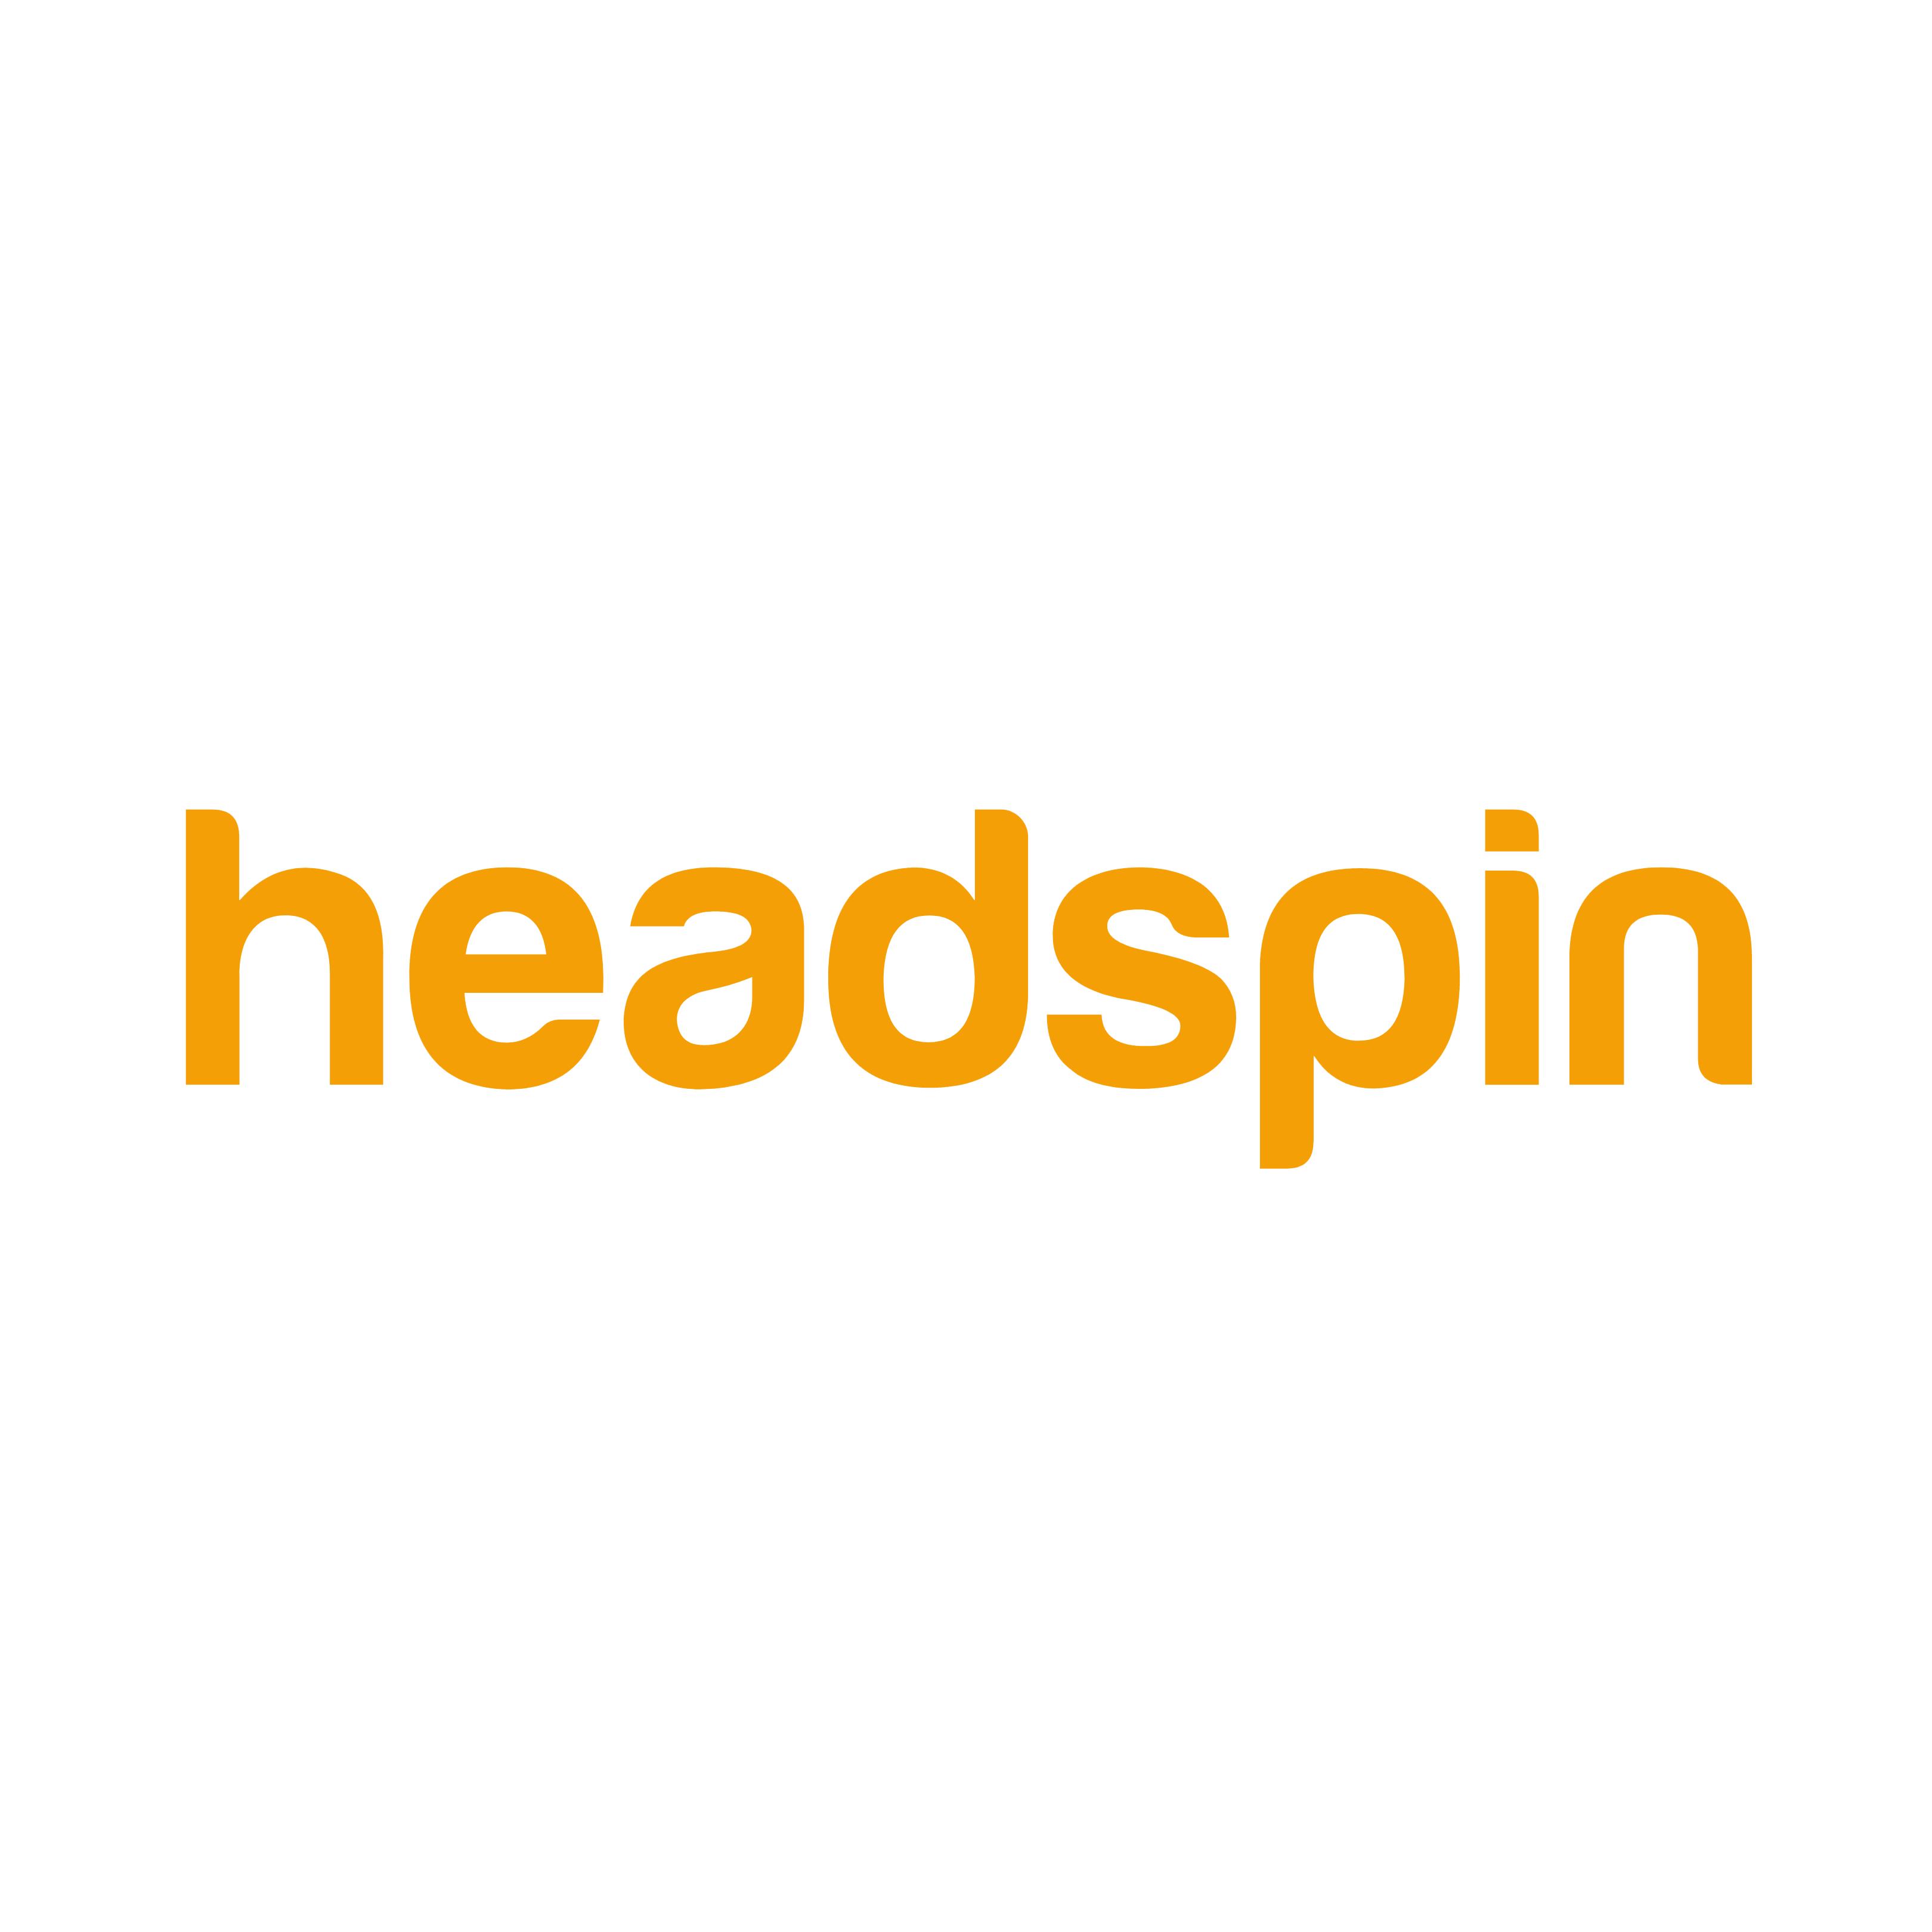 HeadSpin Inc